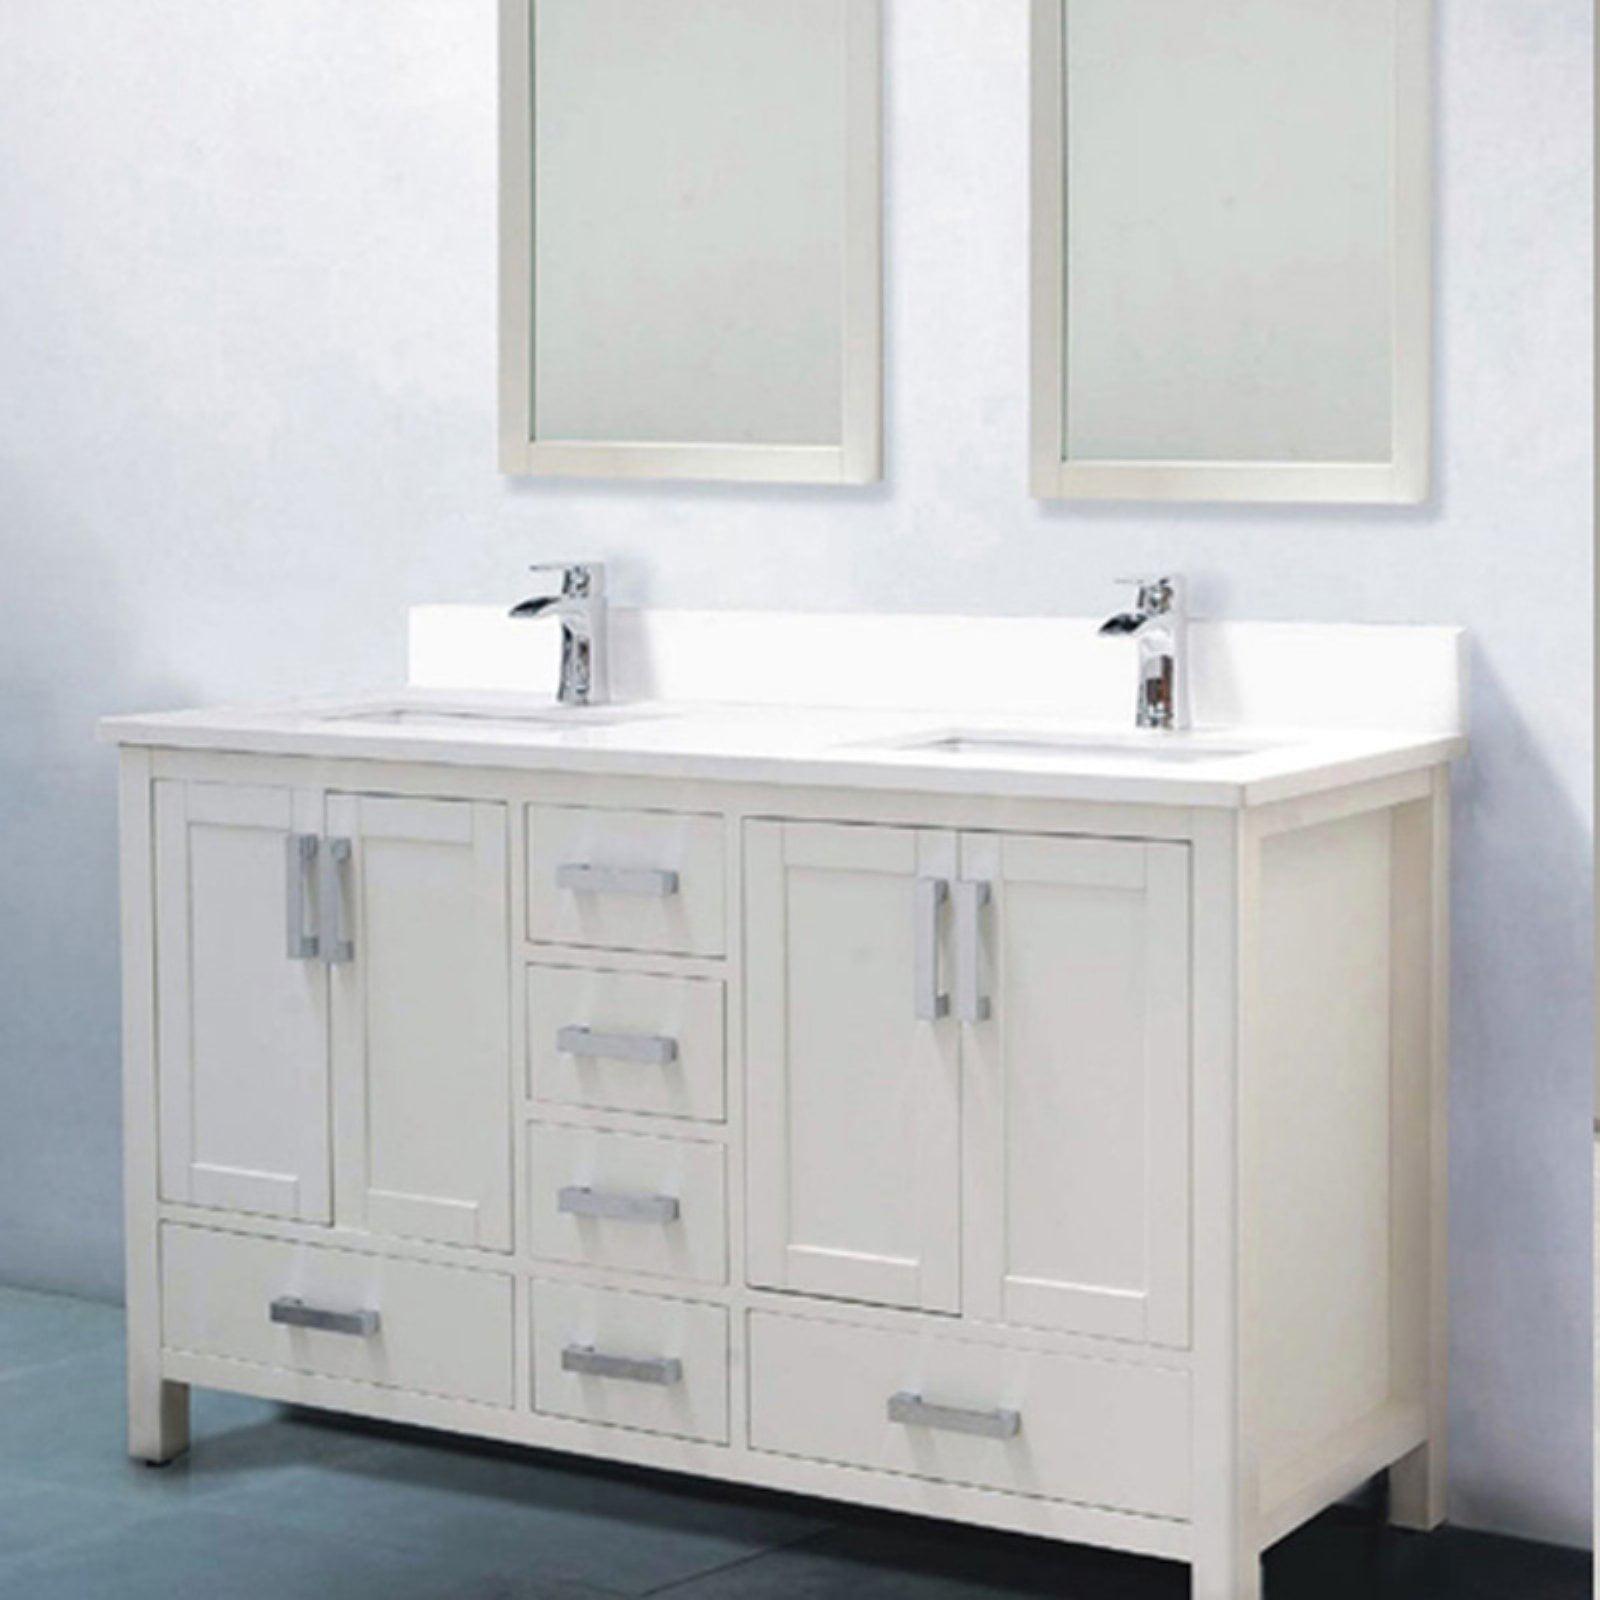 Adornus Astoria 59 In Double Bathroom Vanity With 2 Mirrors